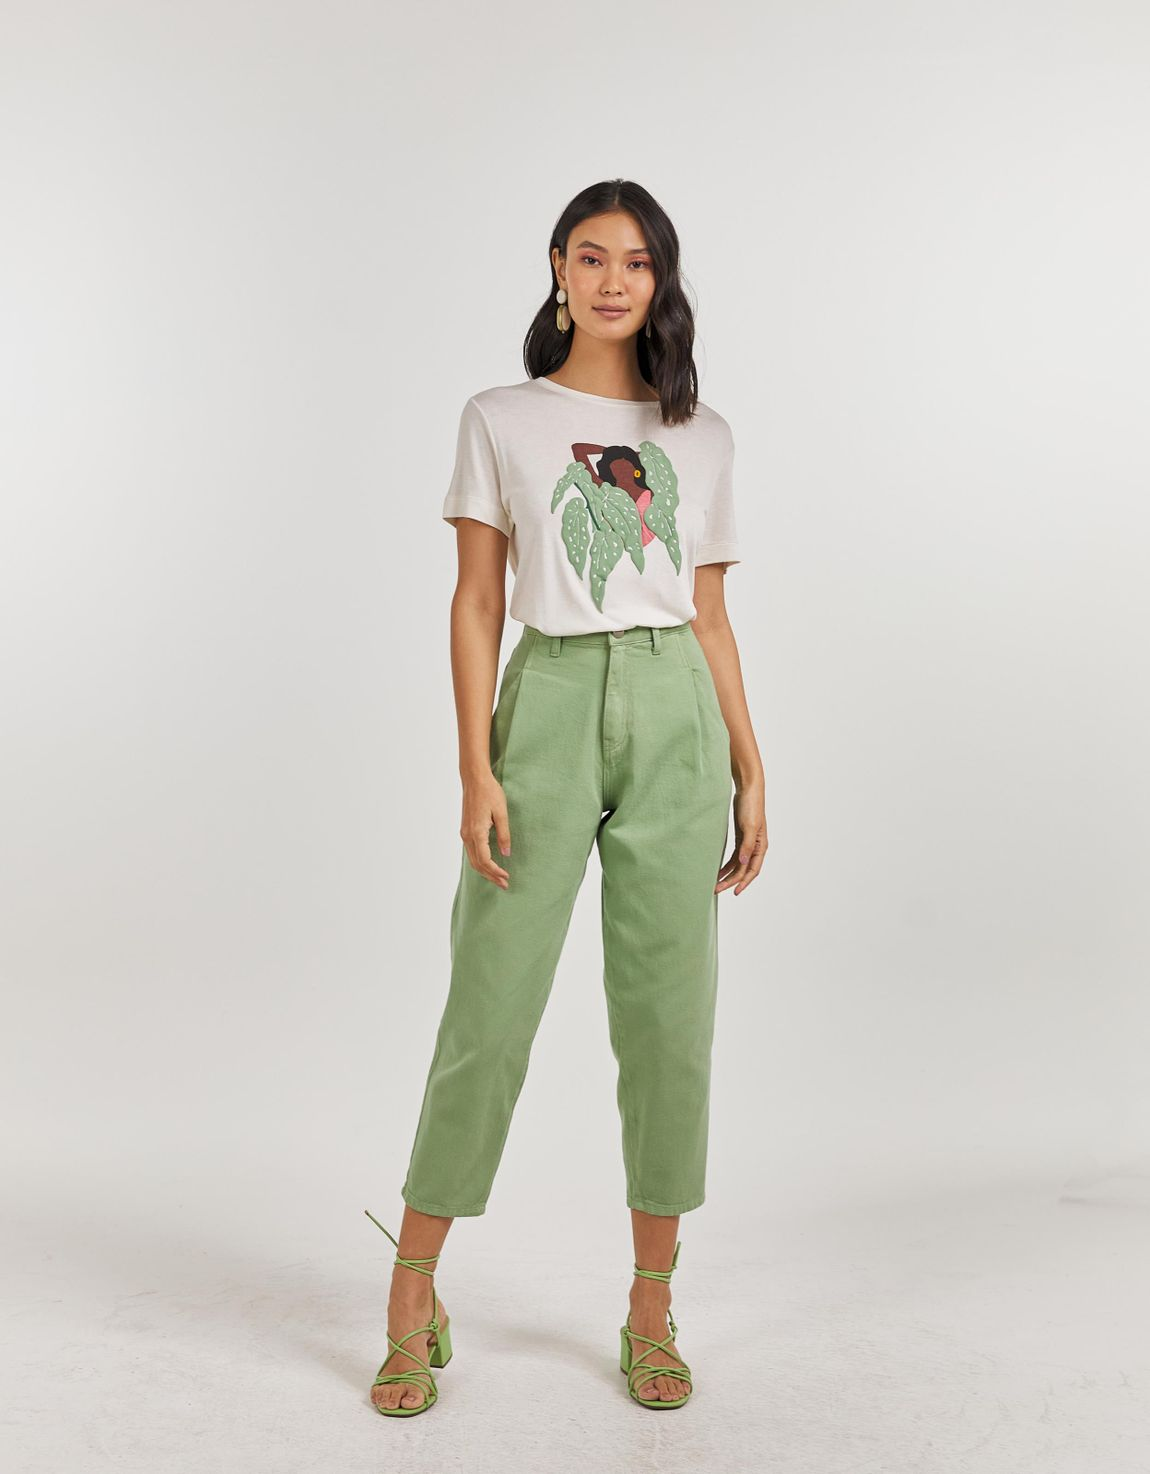 T-shirt mulher begonia